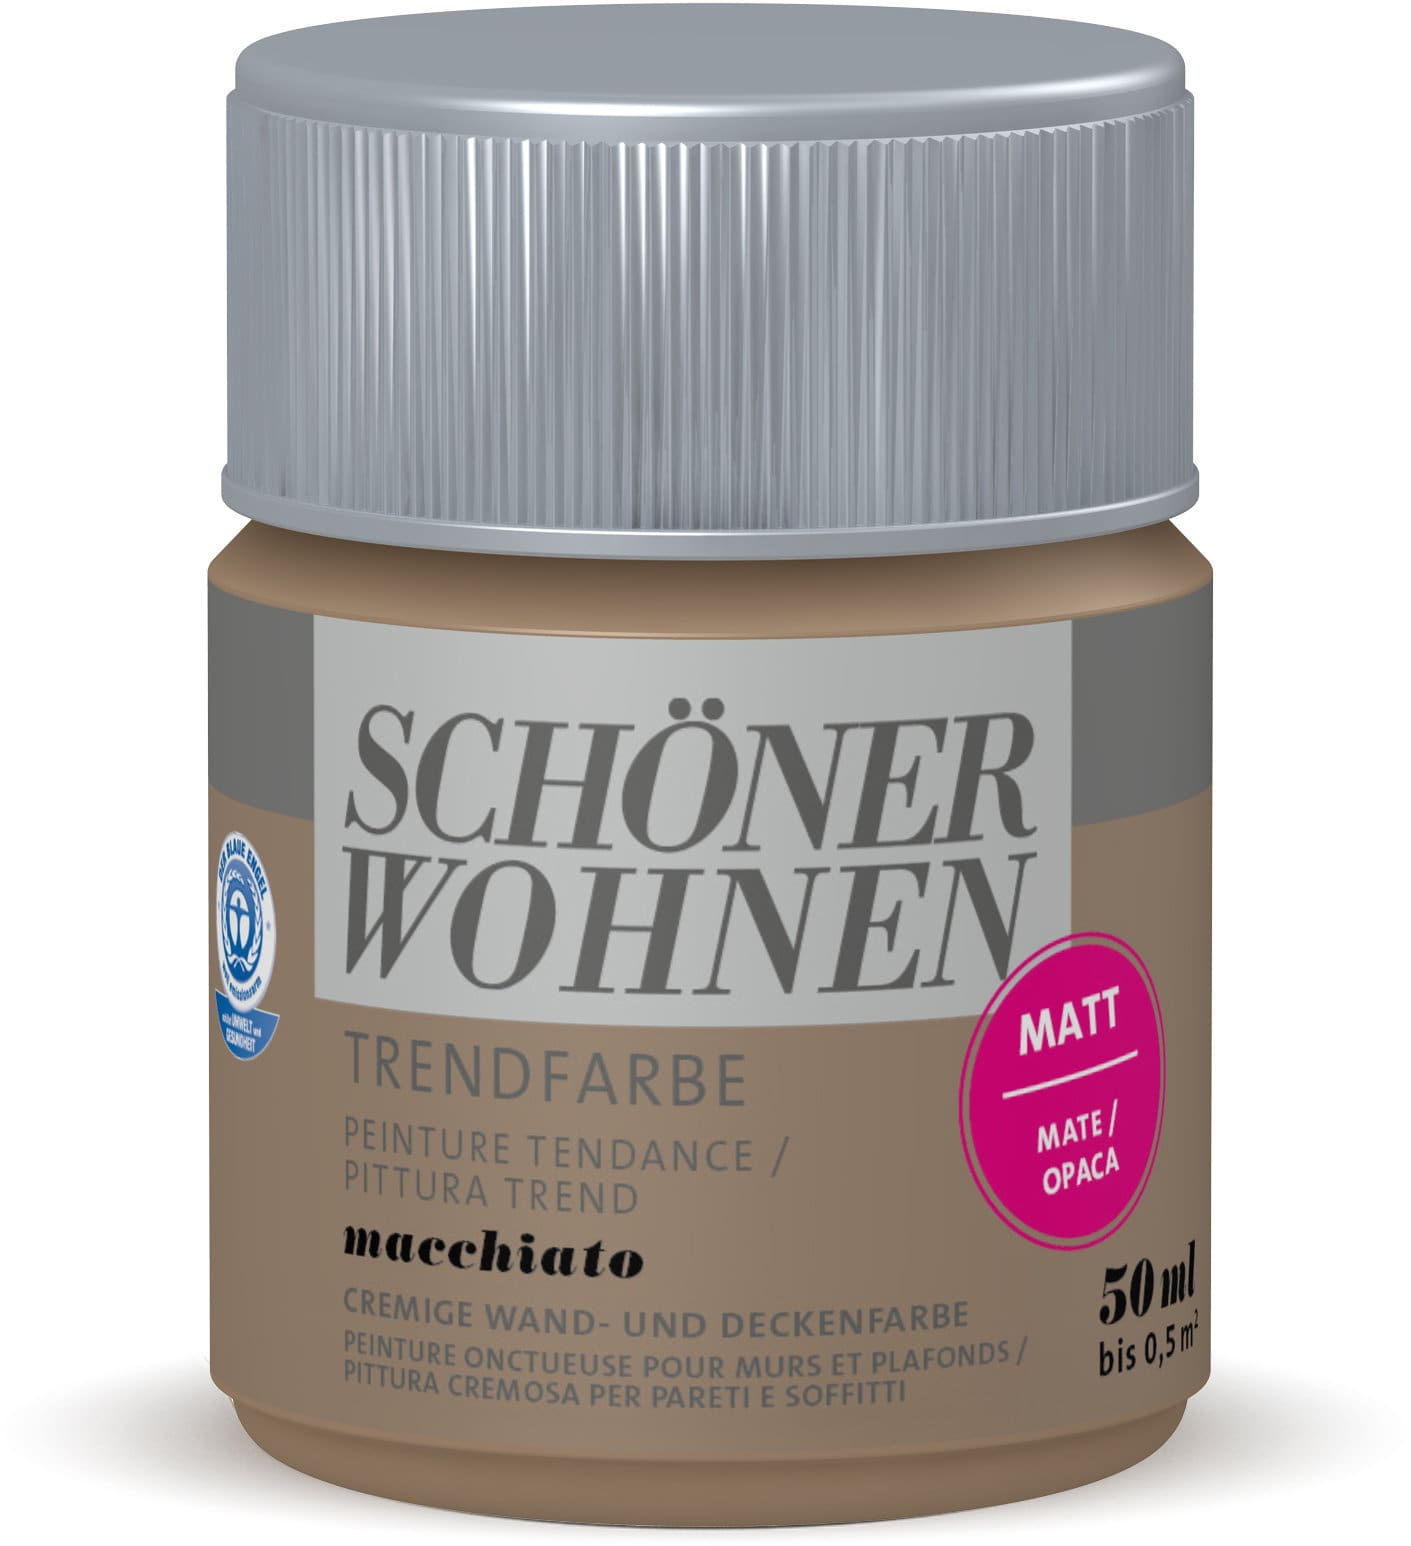 Schöner Wohnen Testeur de couleur tendance Macchiato 50 ml